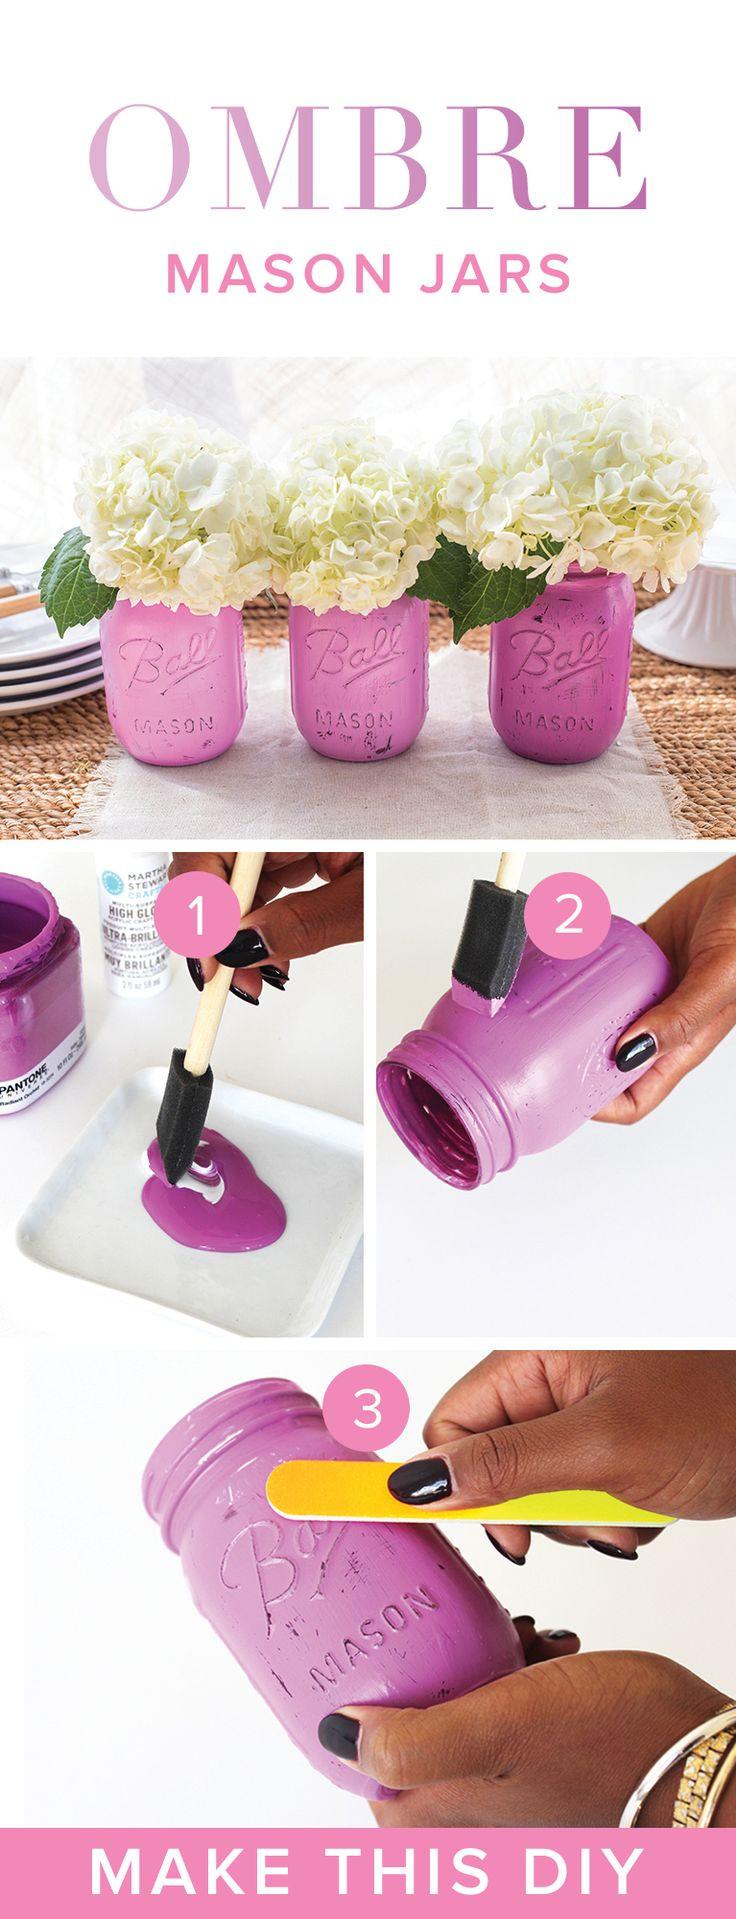 Best ideas about Mason Jar Craft Ideas . Save or Pin Ten Inspirational DIY Mason Jar Ideas For Weddings Now.